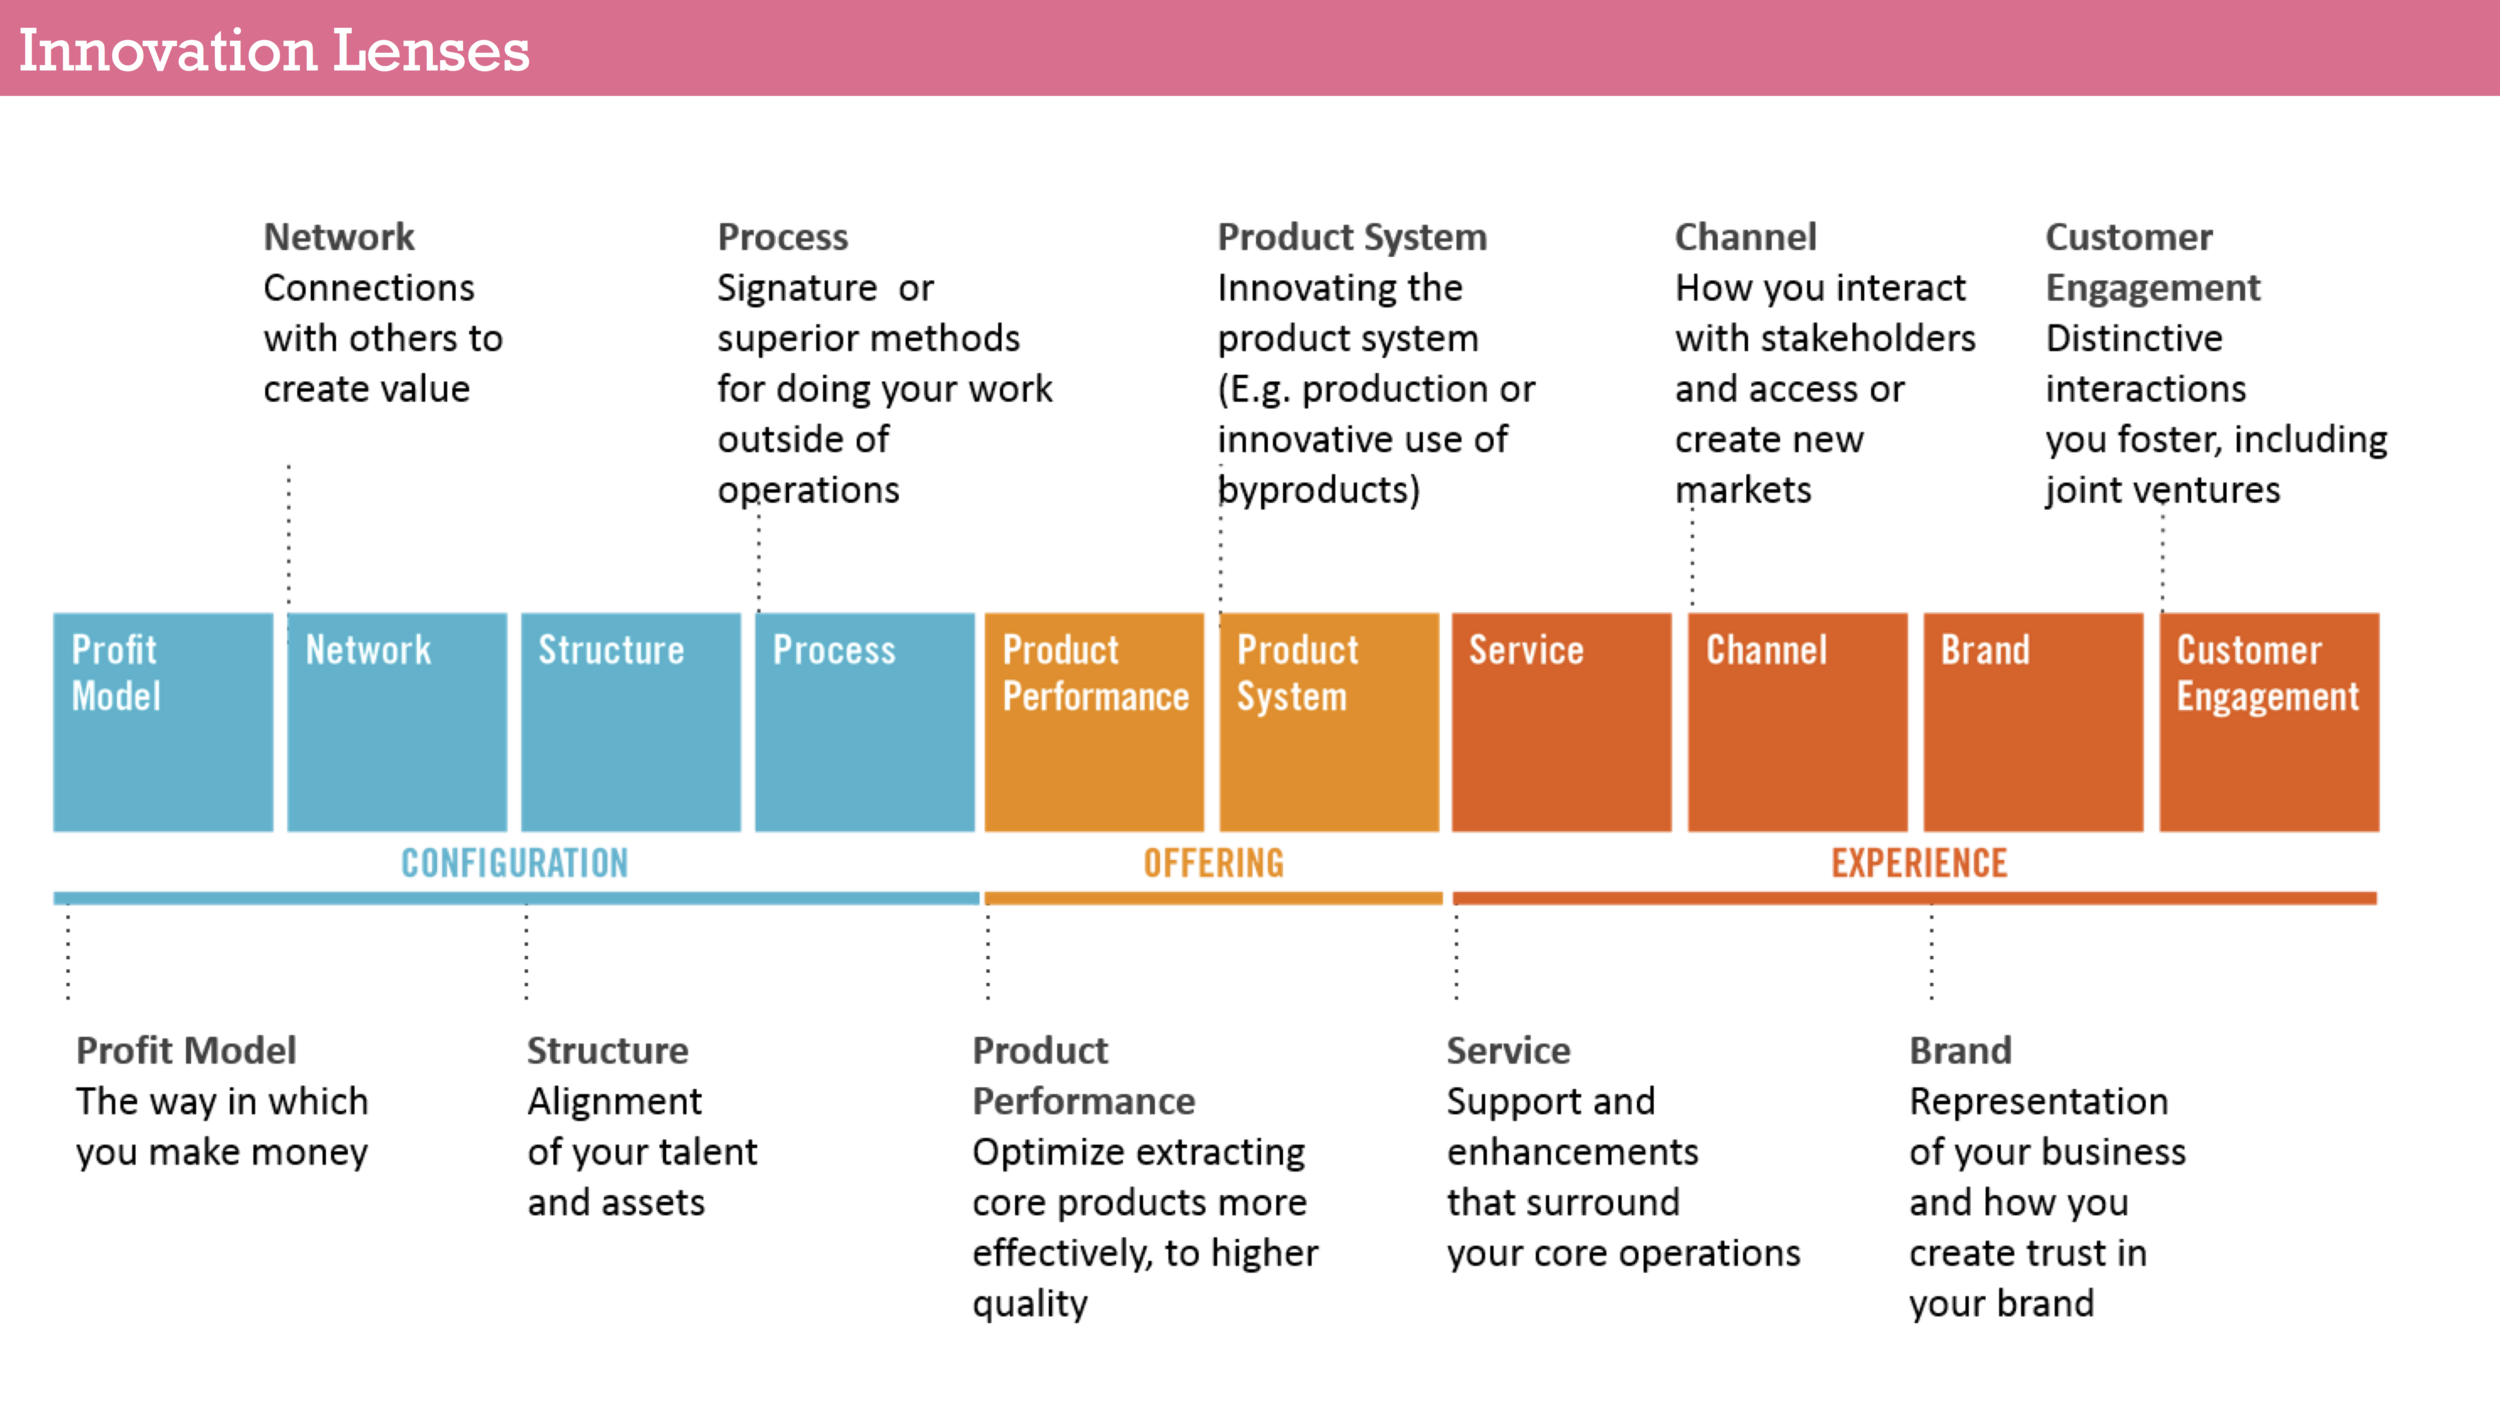 An overview of the 10 Doblin Innovation Lenses